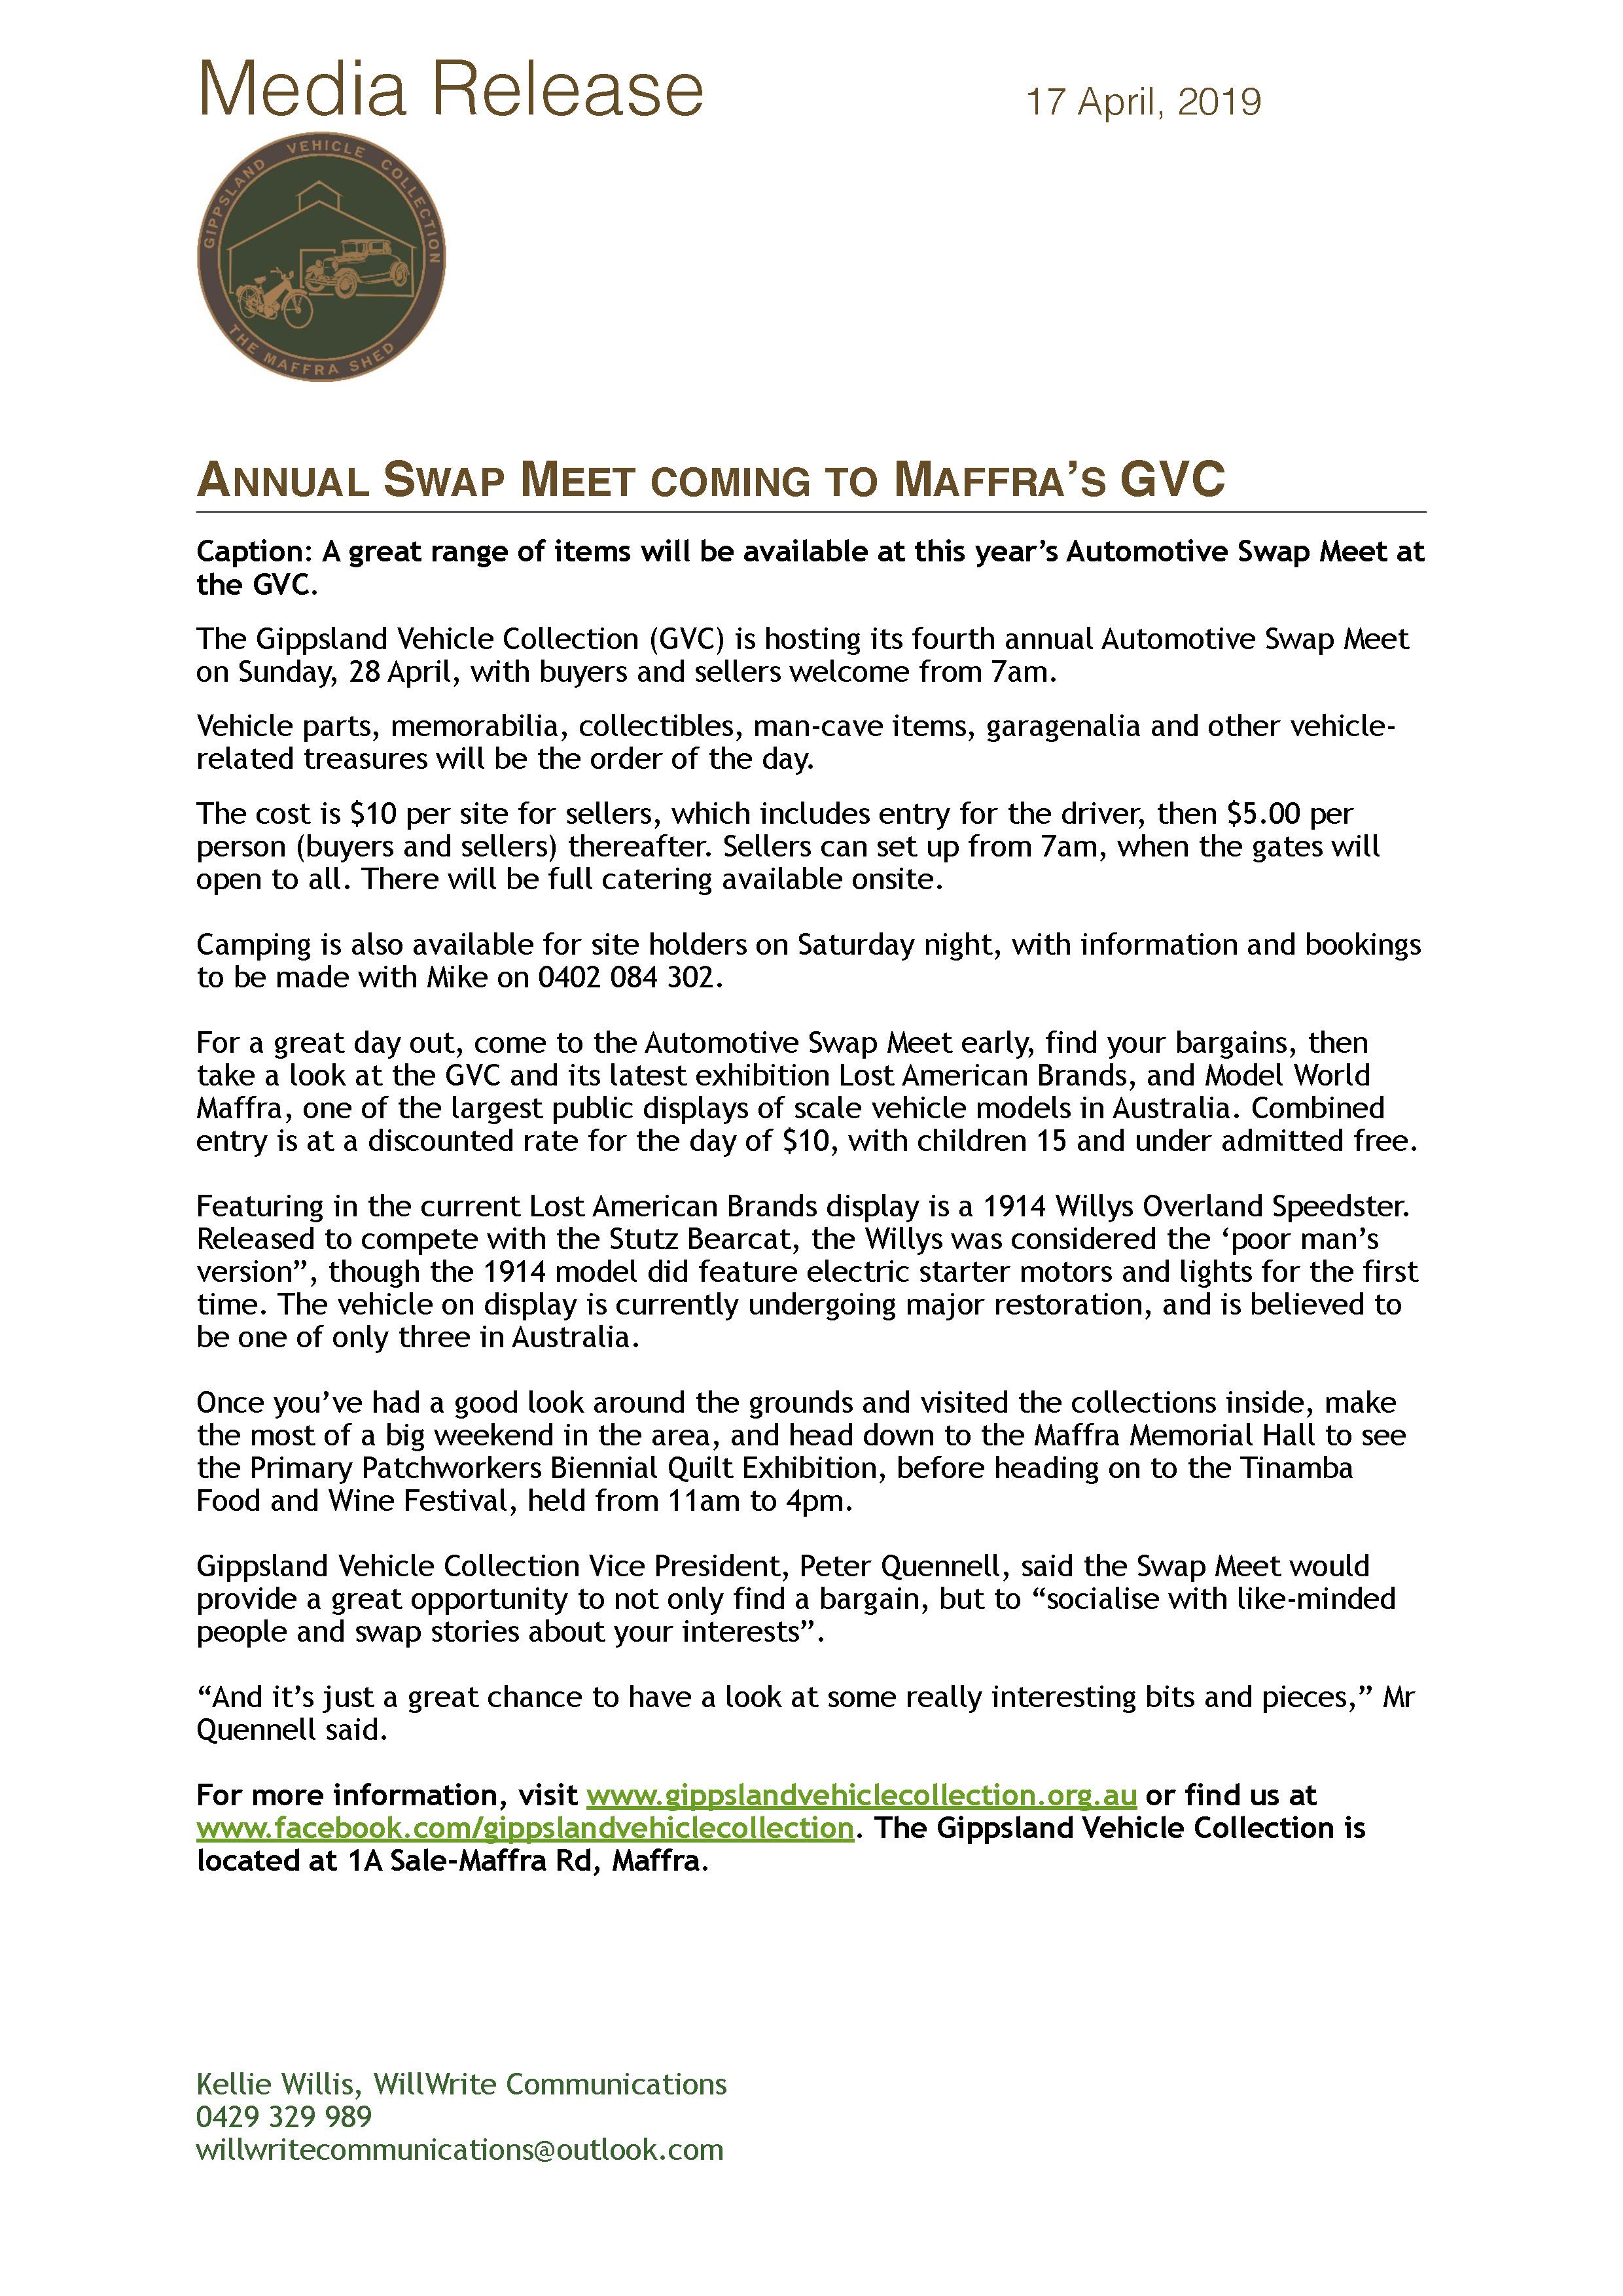 Media Release - Swap Meet 2019 - 17 April 19.jpg